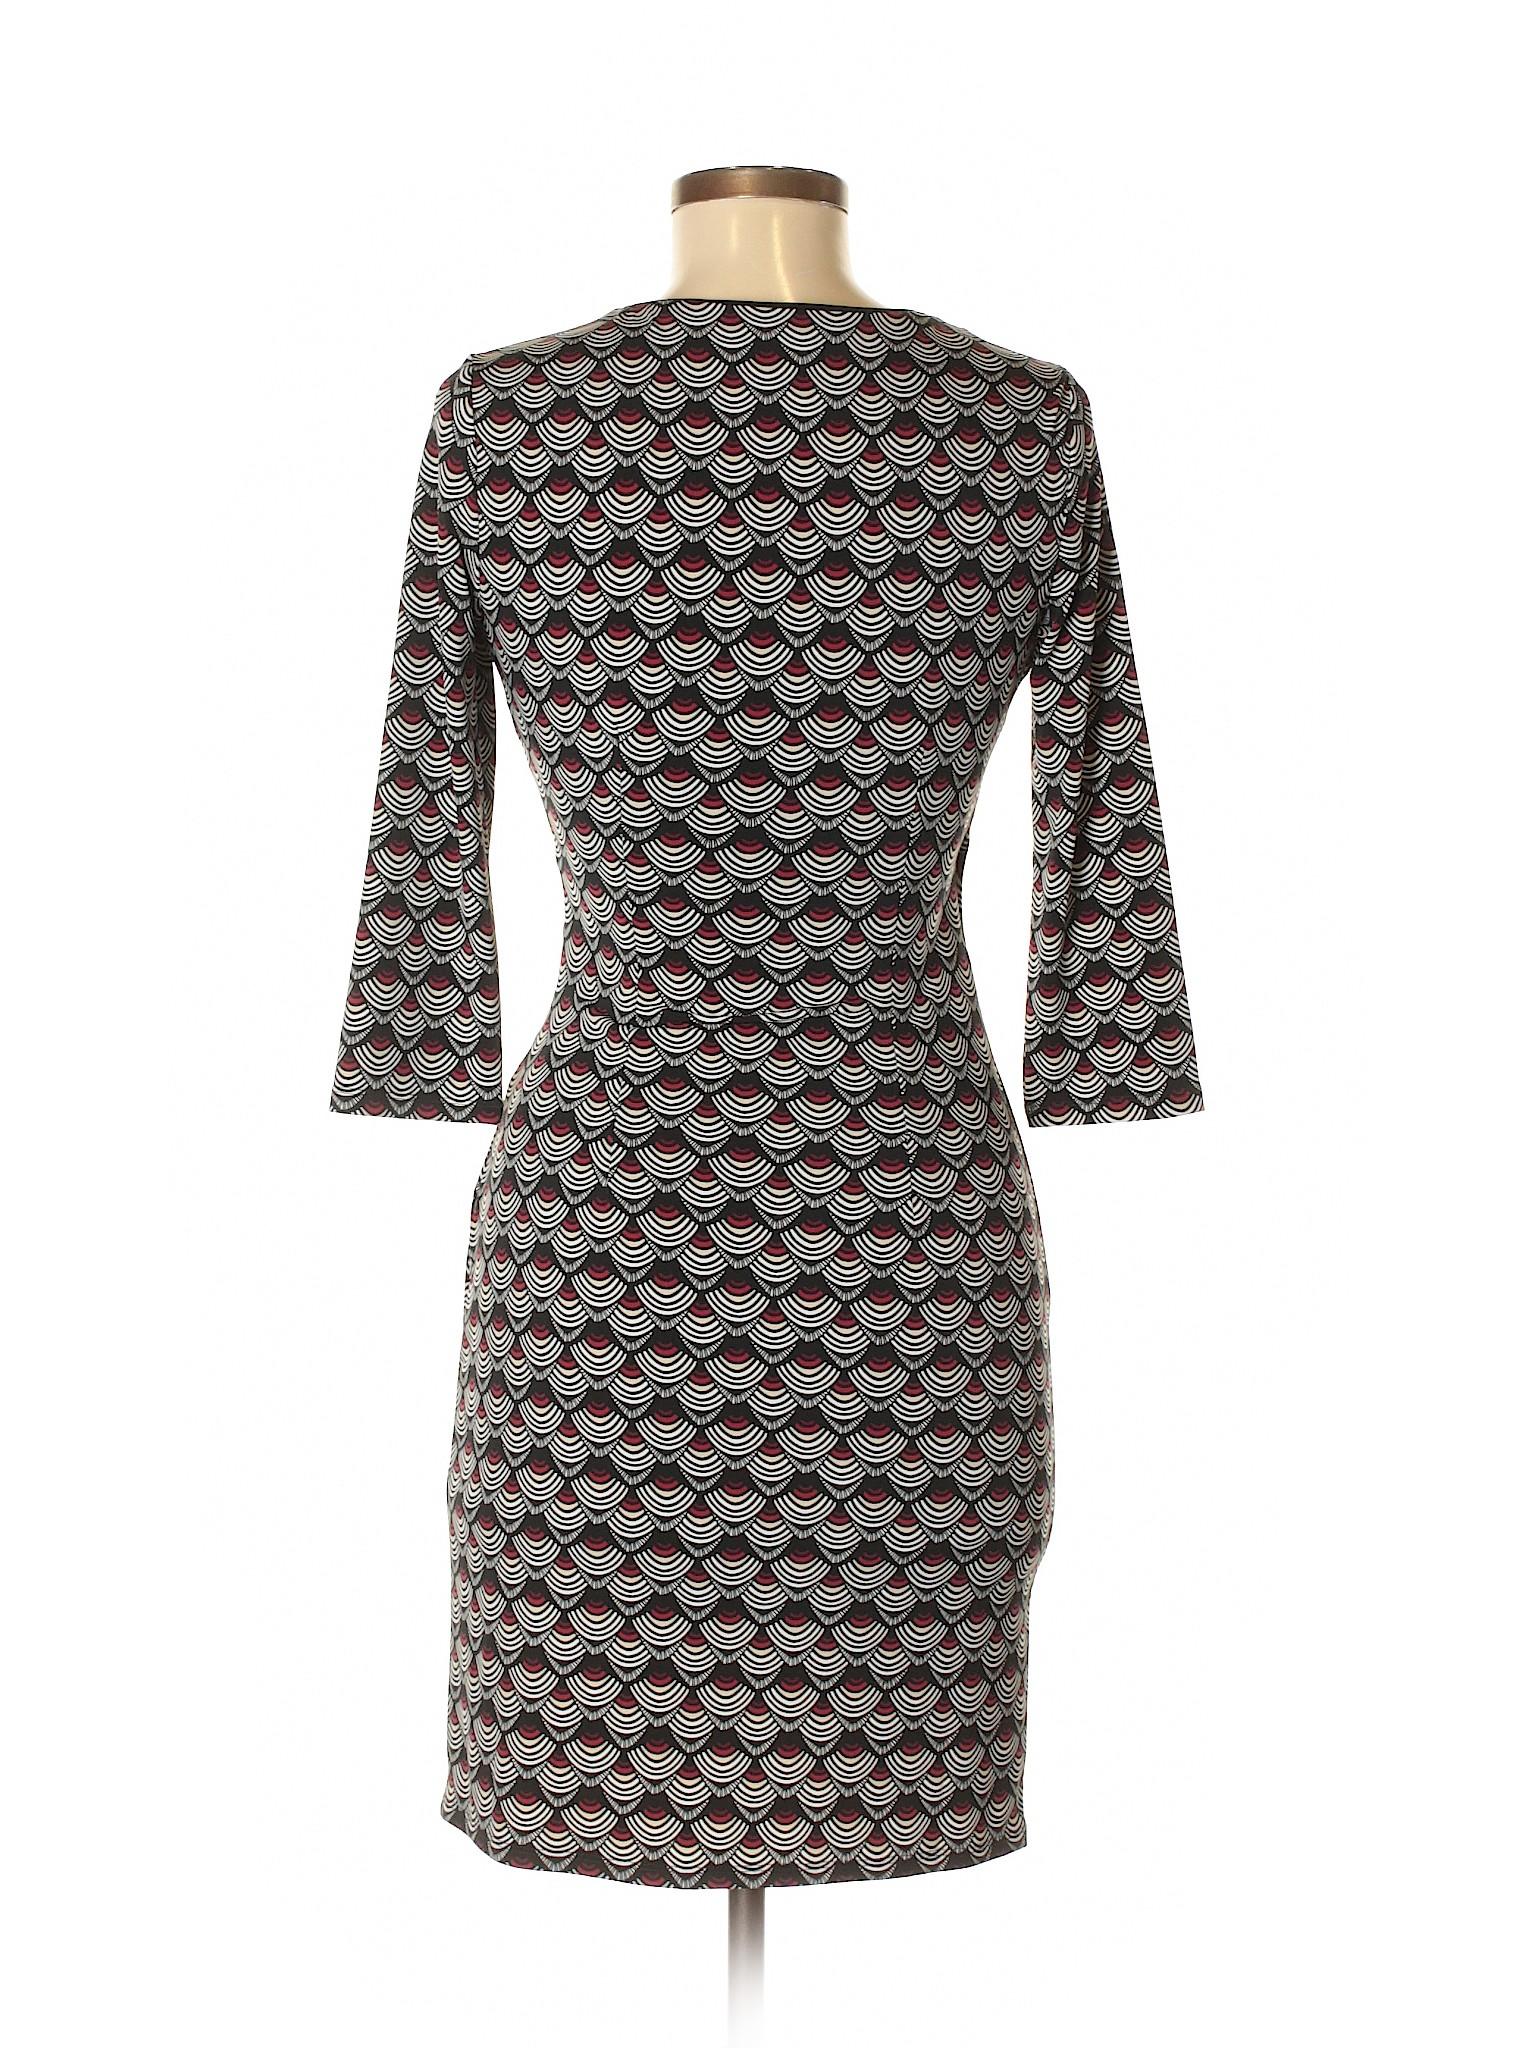 White Black Market Selling Casual House Dress pEqd00O7nx